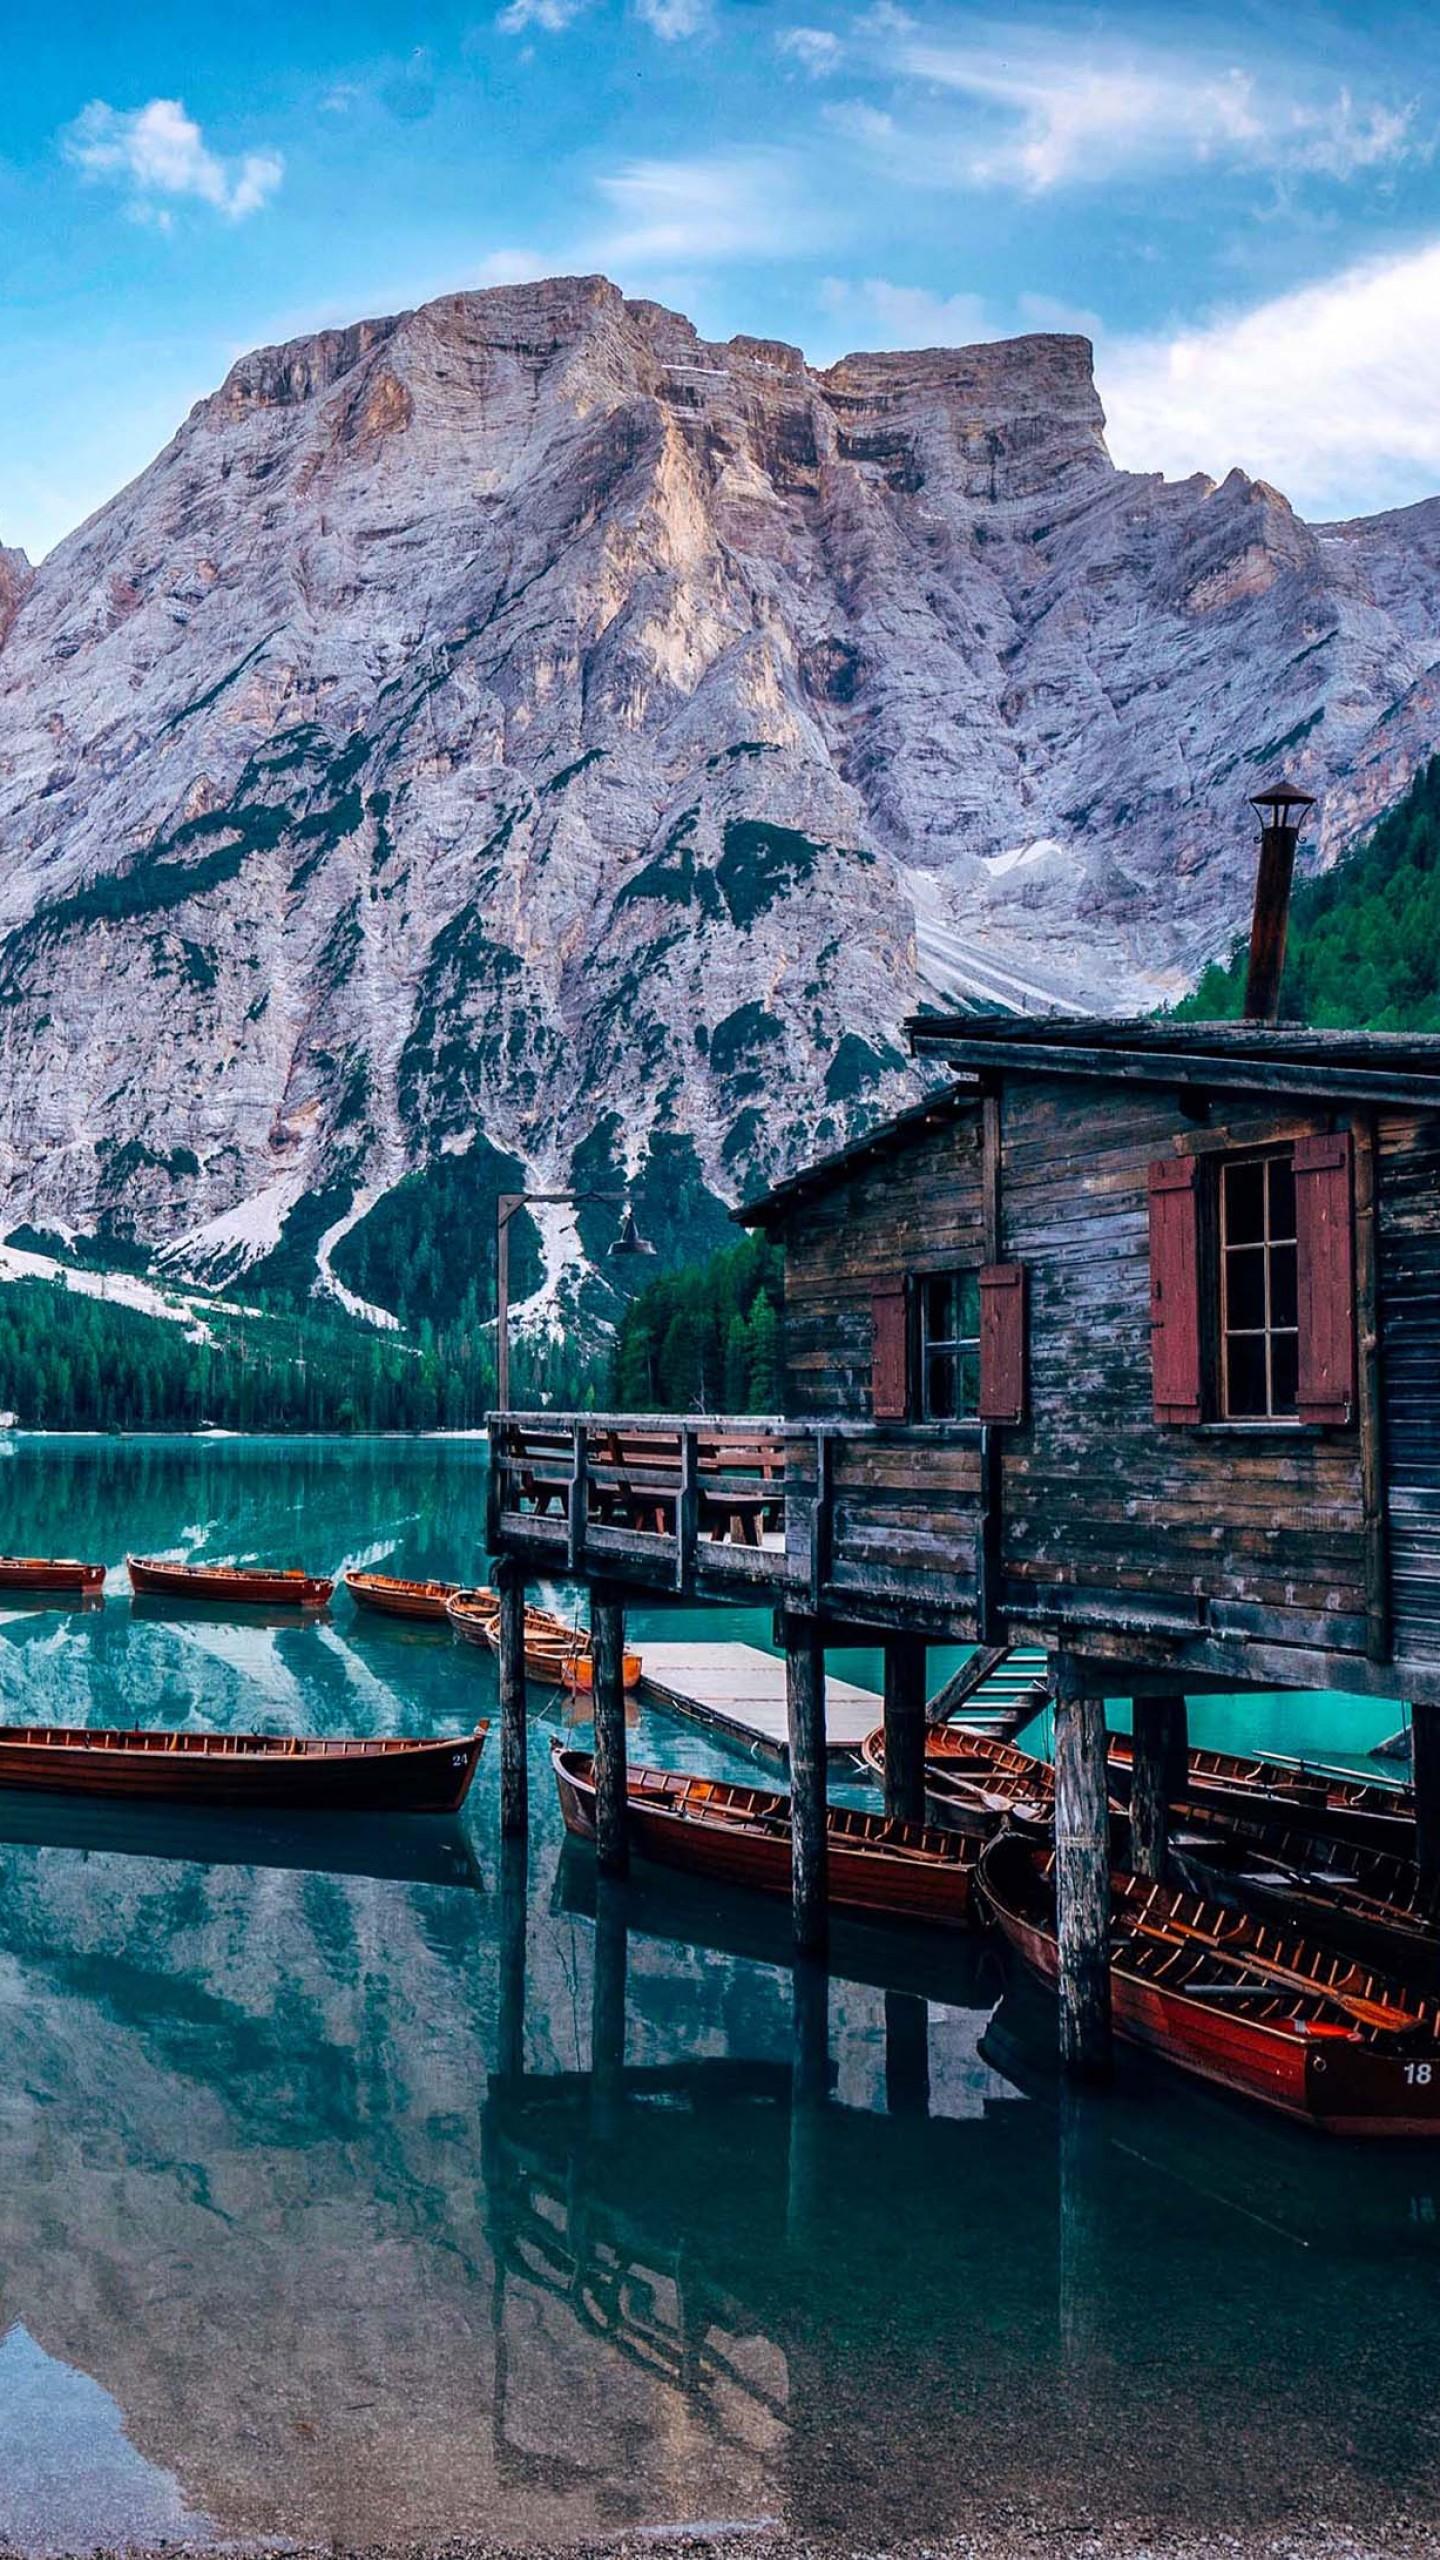 Wallpaper Pragser Wildsee Lake Italy Europe 4k Travel